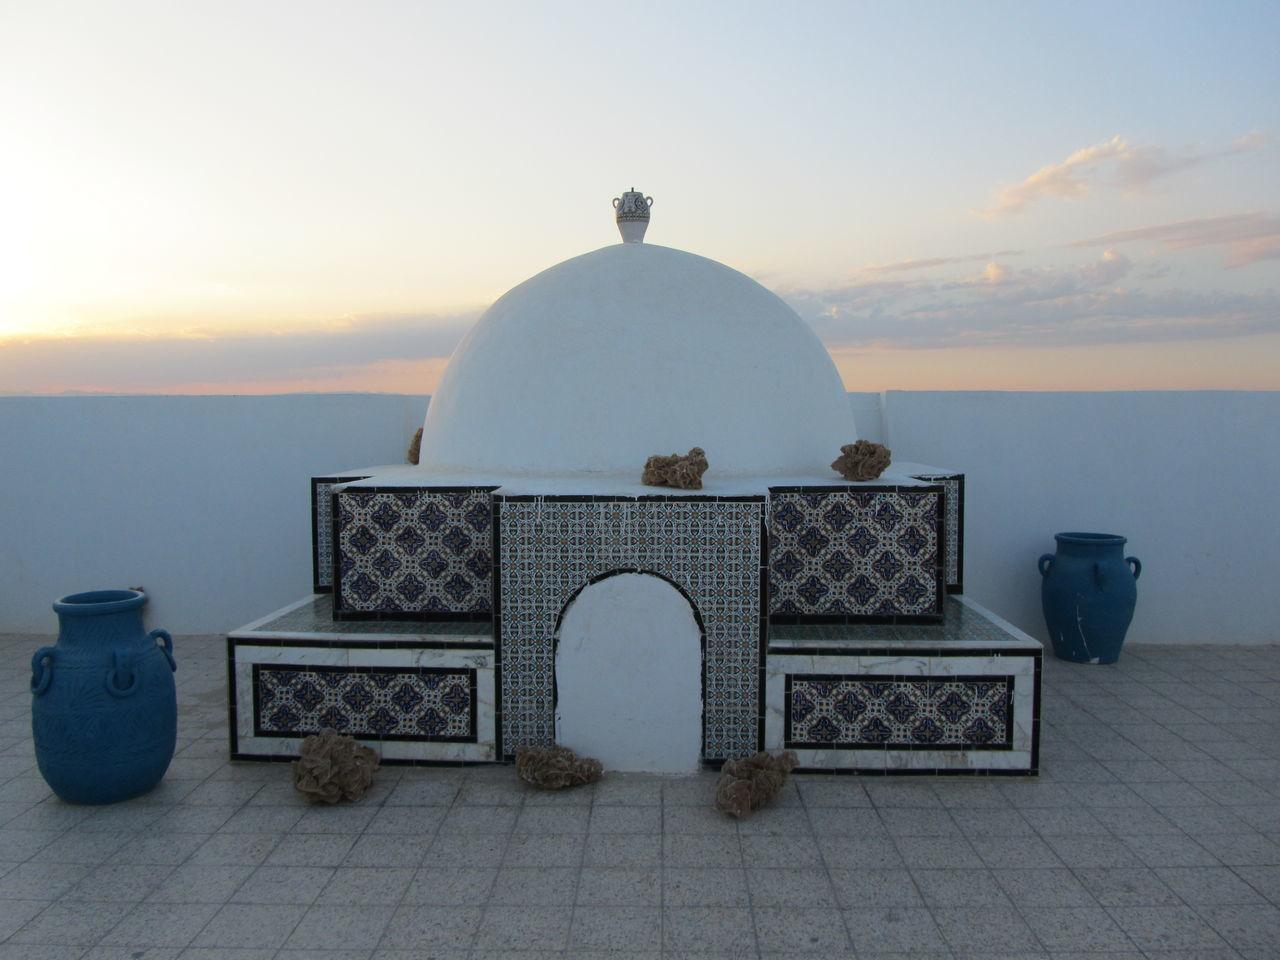 Sky Sightseing Vacation Time Daytime No People Where To Go Enyoy The Moment Tunisia Ceramic Art Travel Aroundtheworld Desert Rose EyeEmNewHere